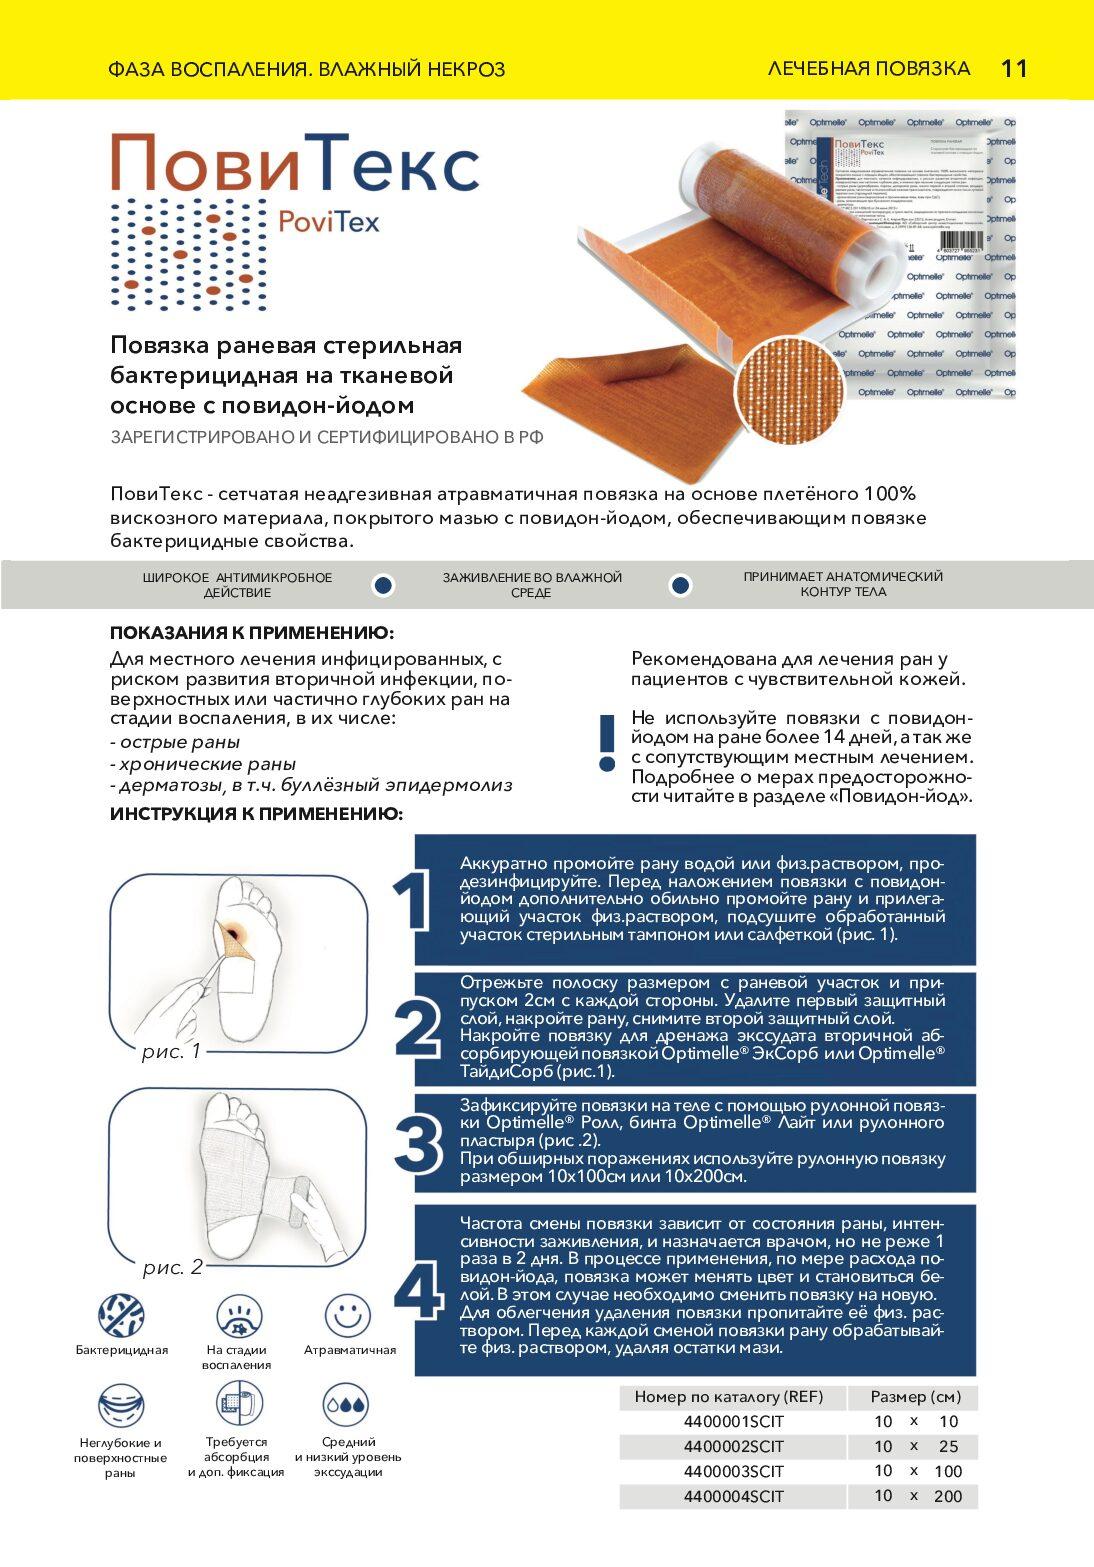 продукции Optimelle2 1 60 11 pdf